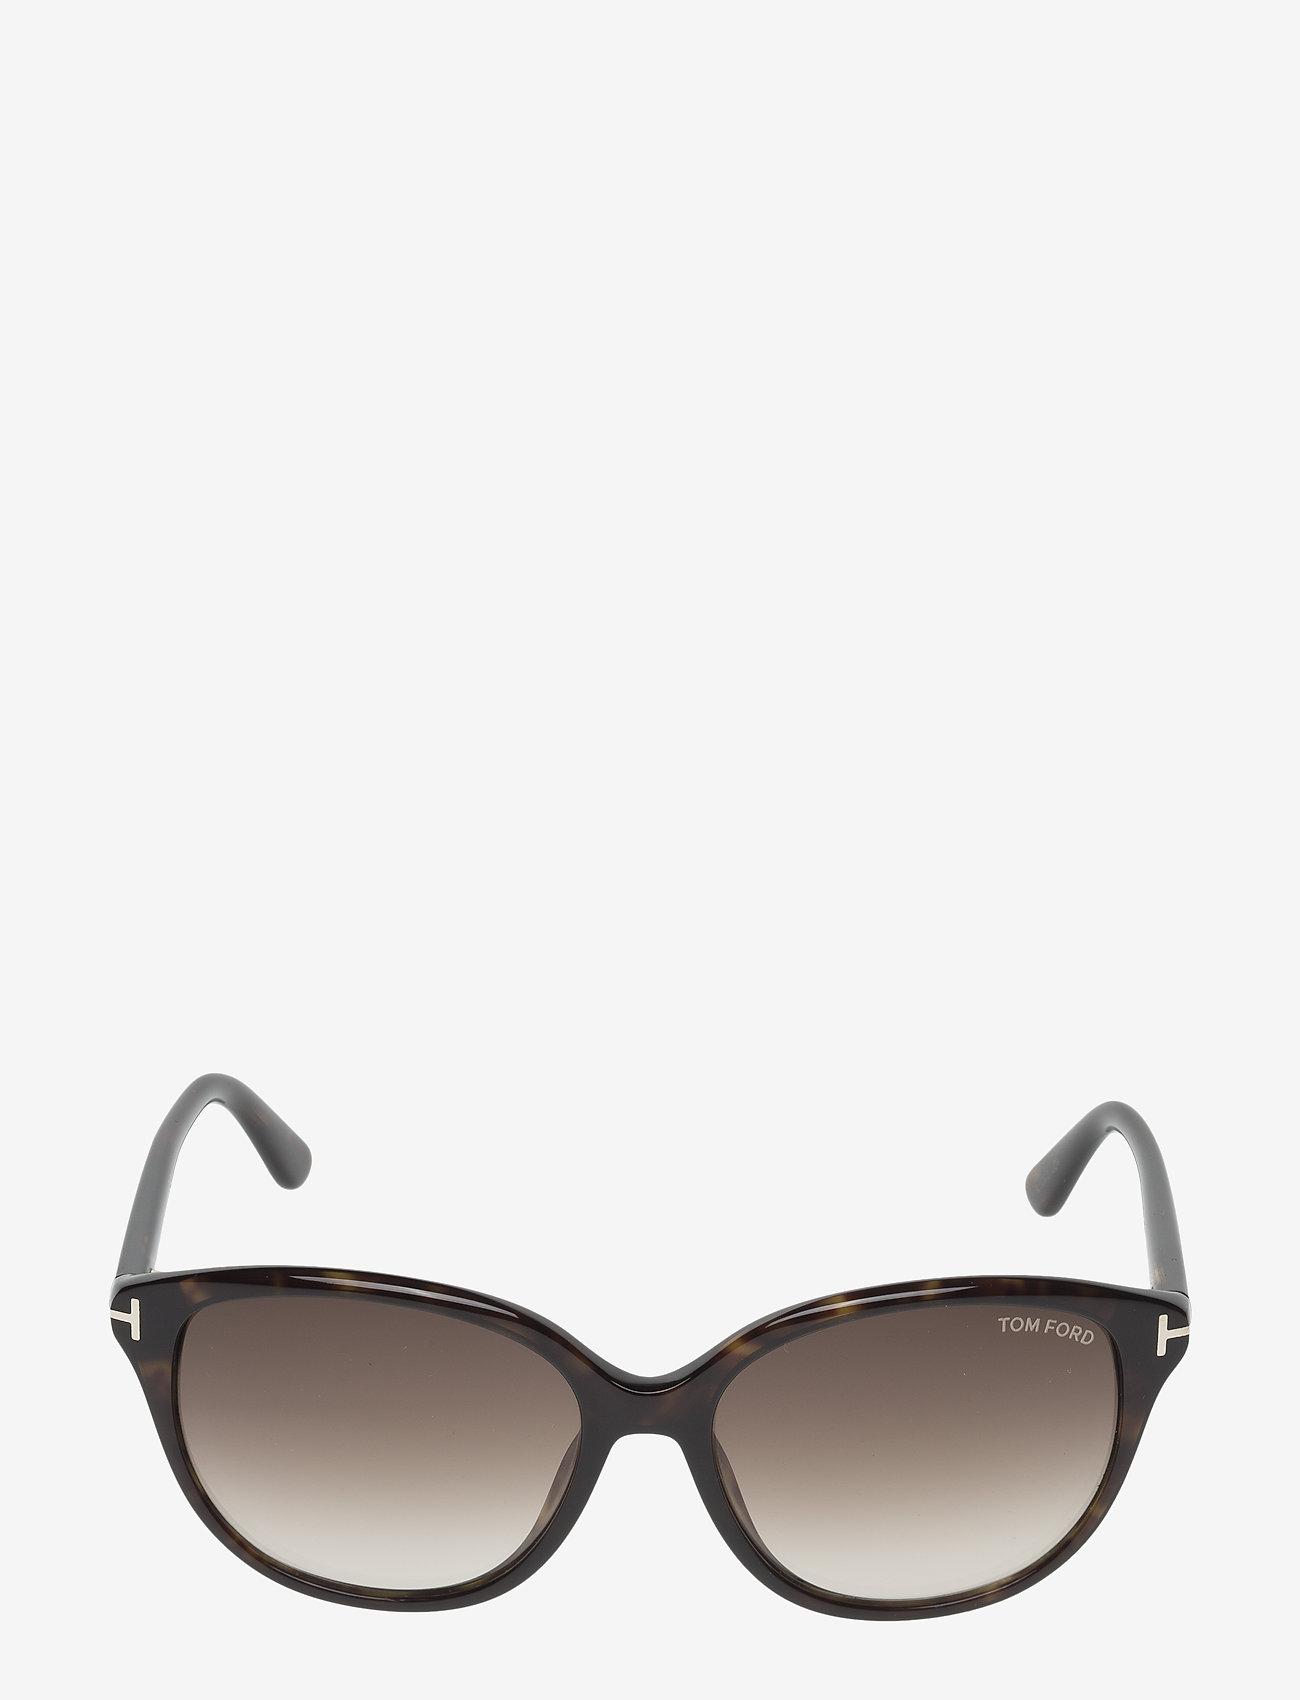 Tom Ford Sunglasses - Tom Ford KARMEN - d formas - 52f -dark havana / gradient brown - 1